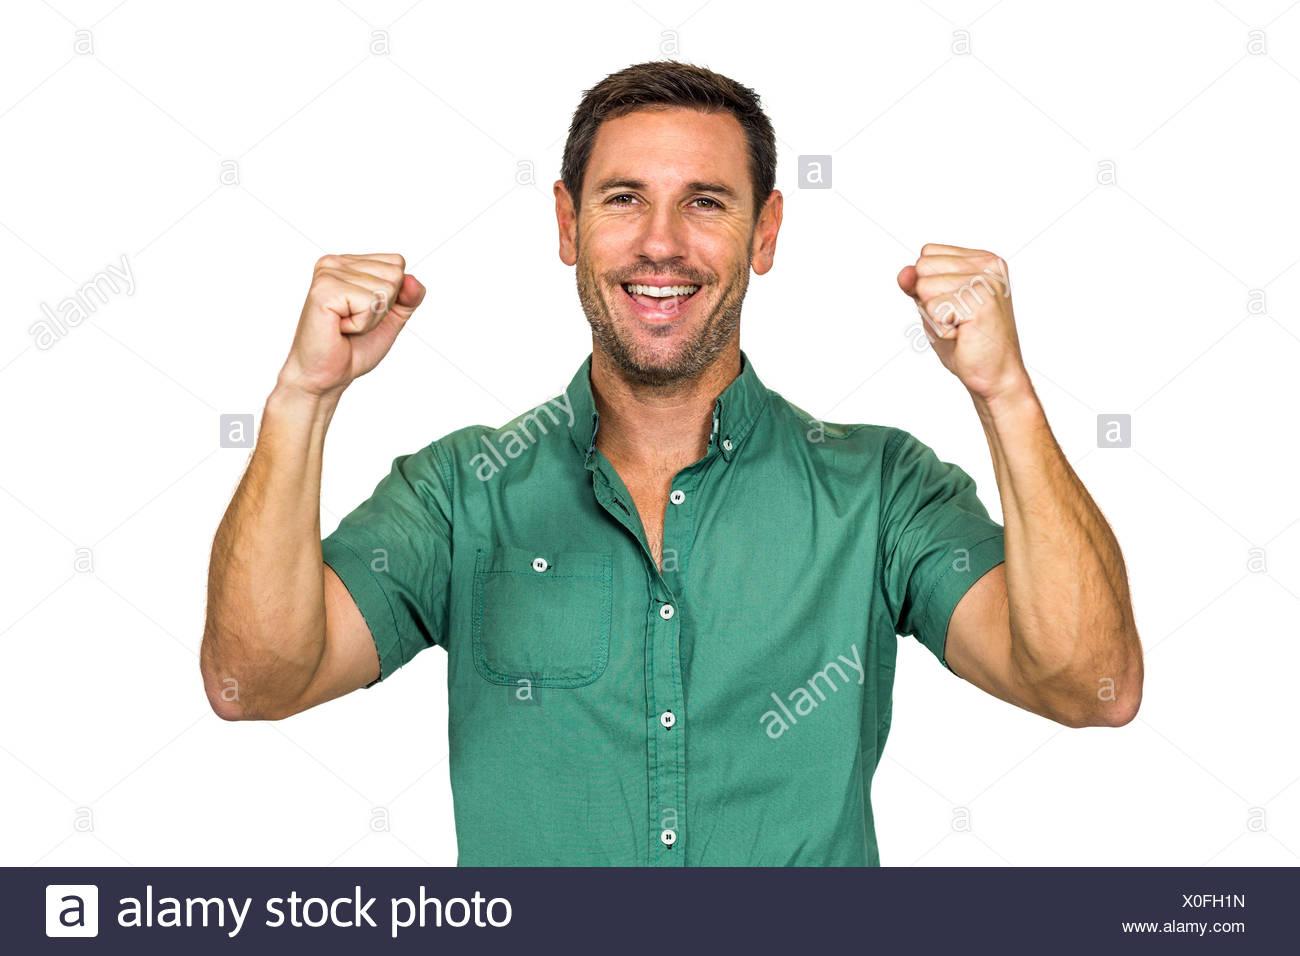 Happy man rejoicing raising fists - Stock Image